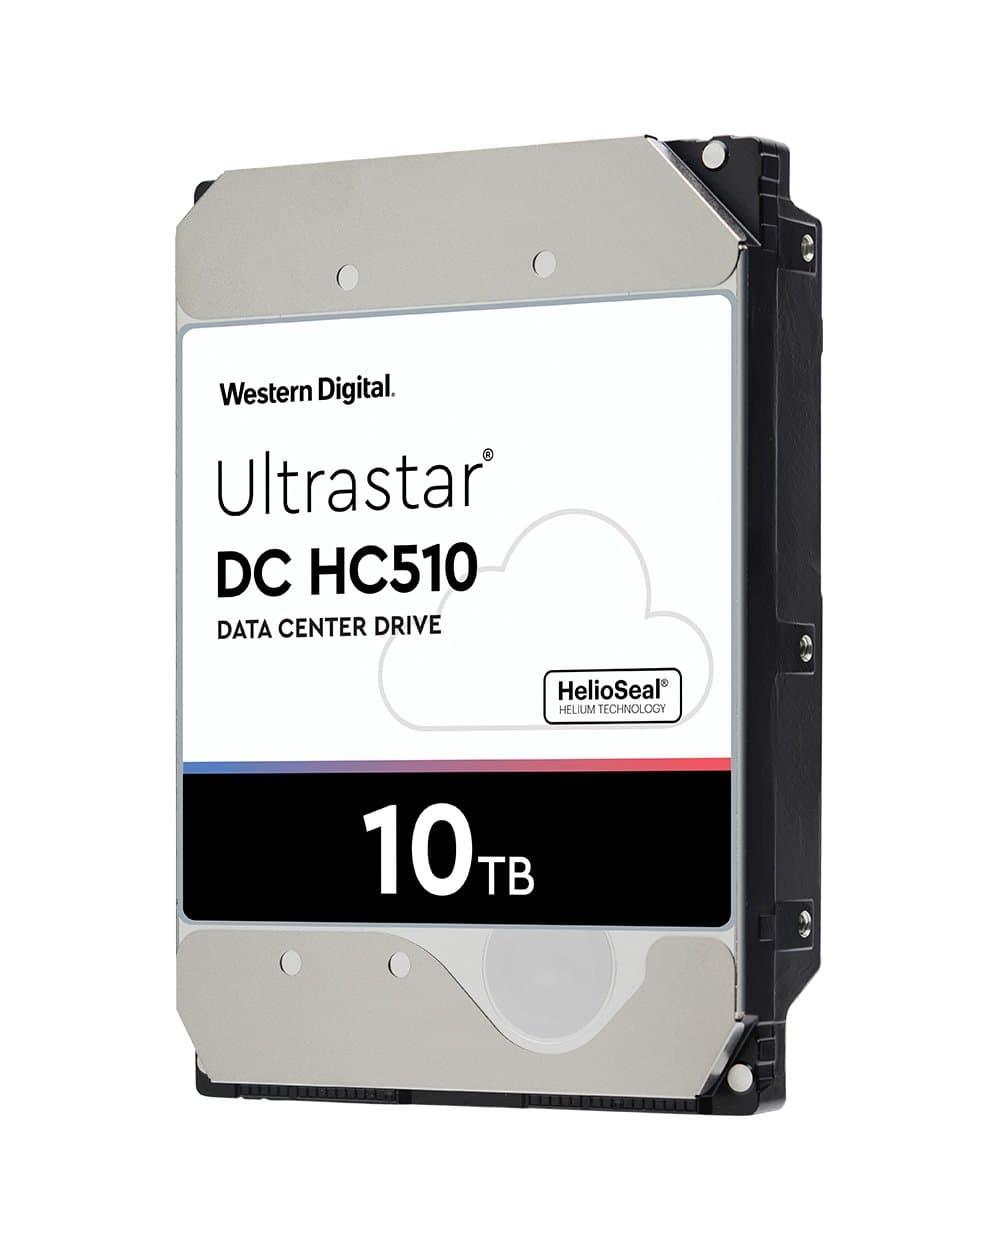 WDC 10TB Ultrastar DC HC510 - Ultrastar DC HC500 Series